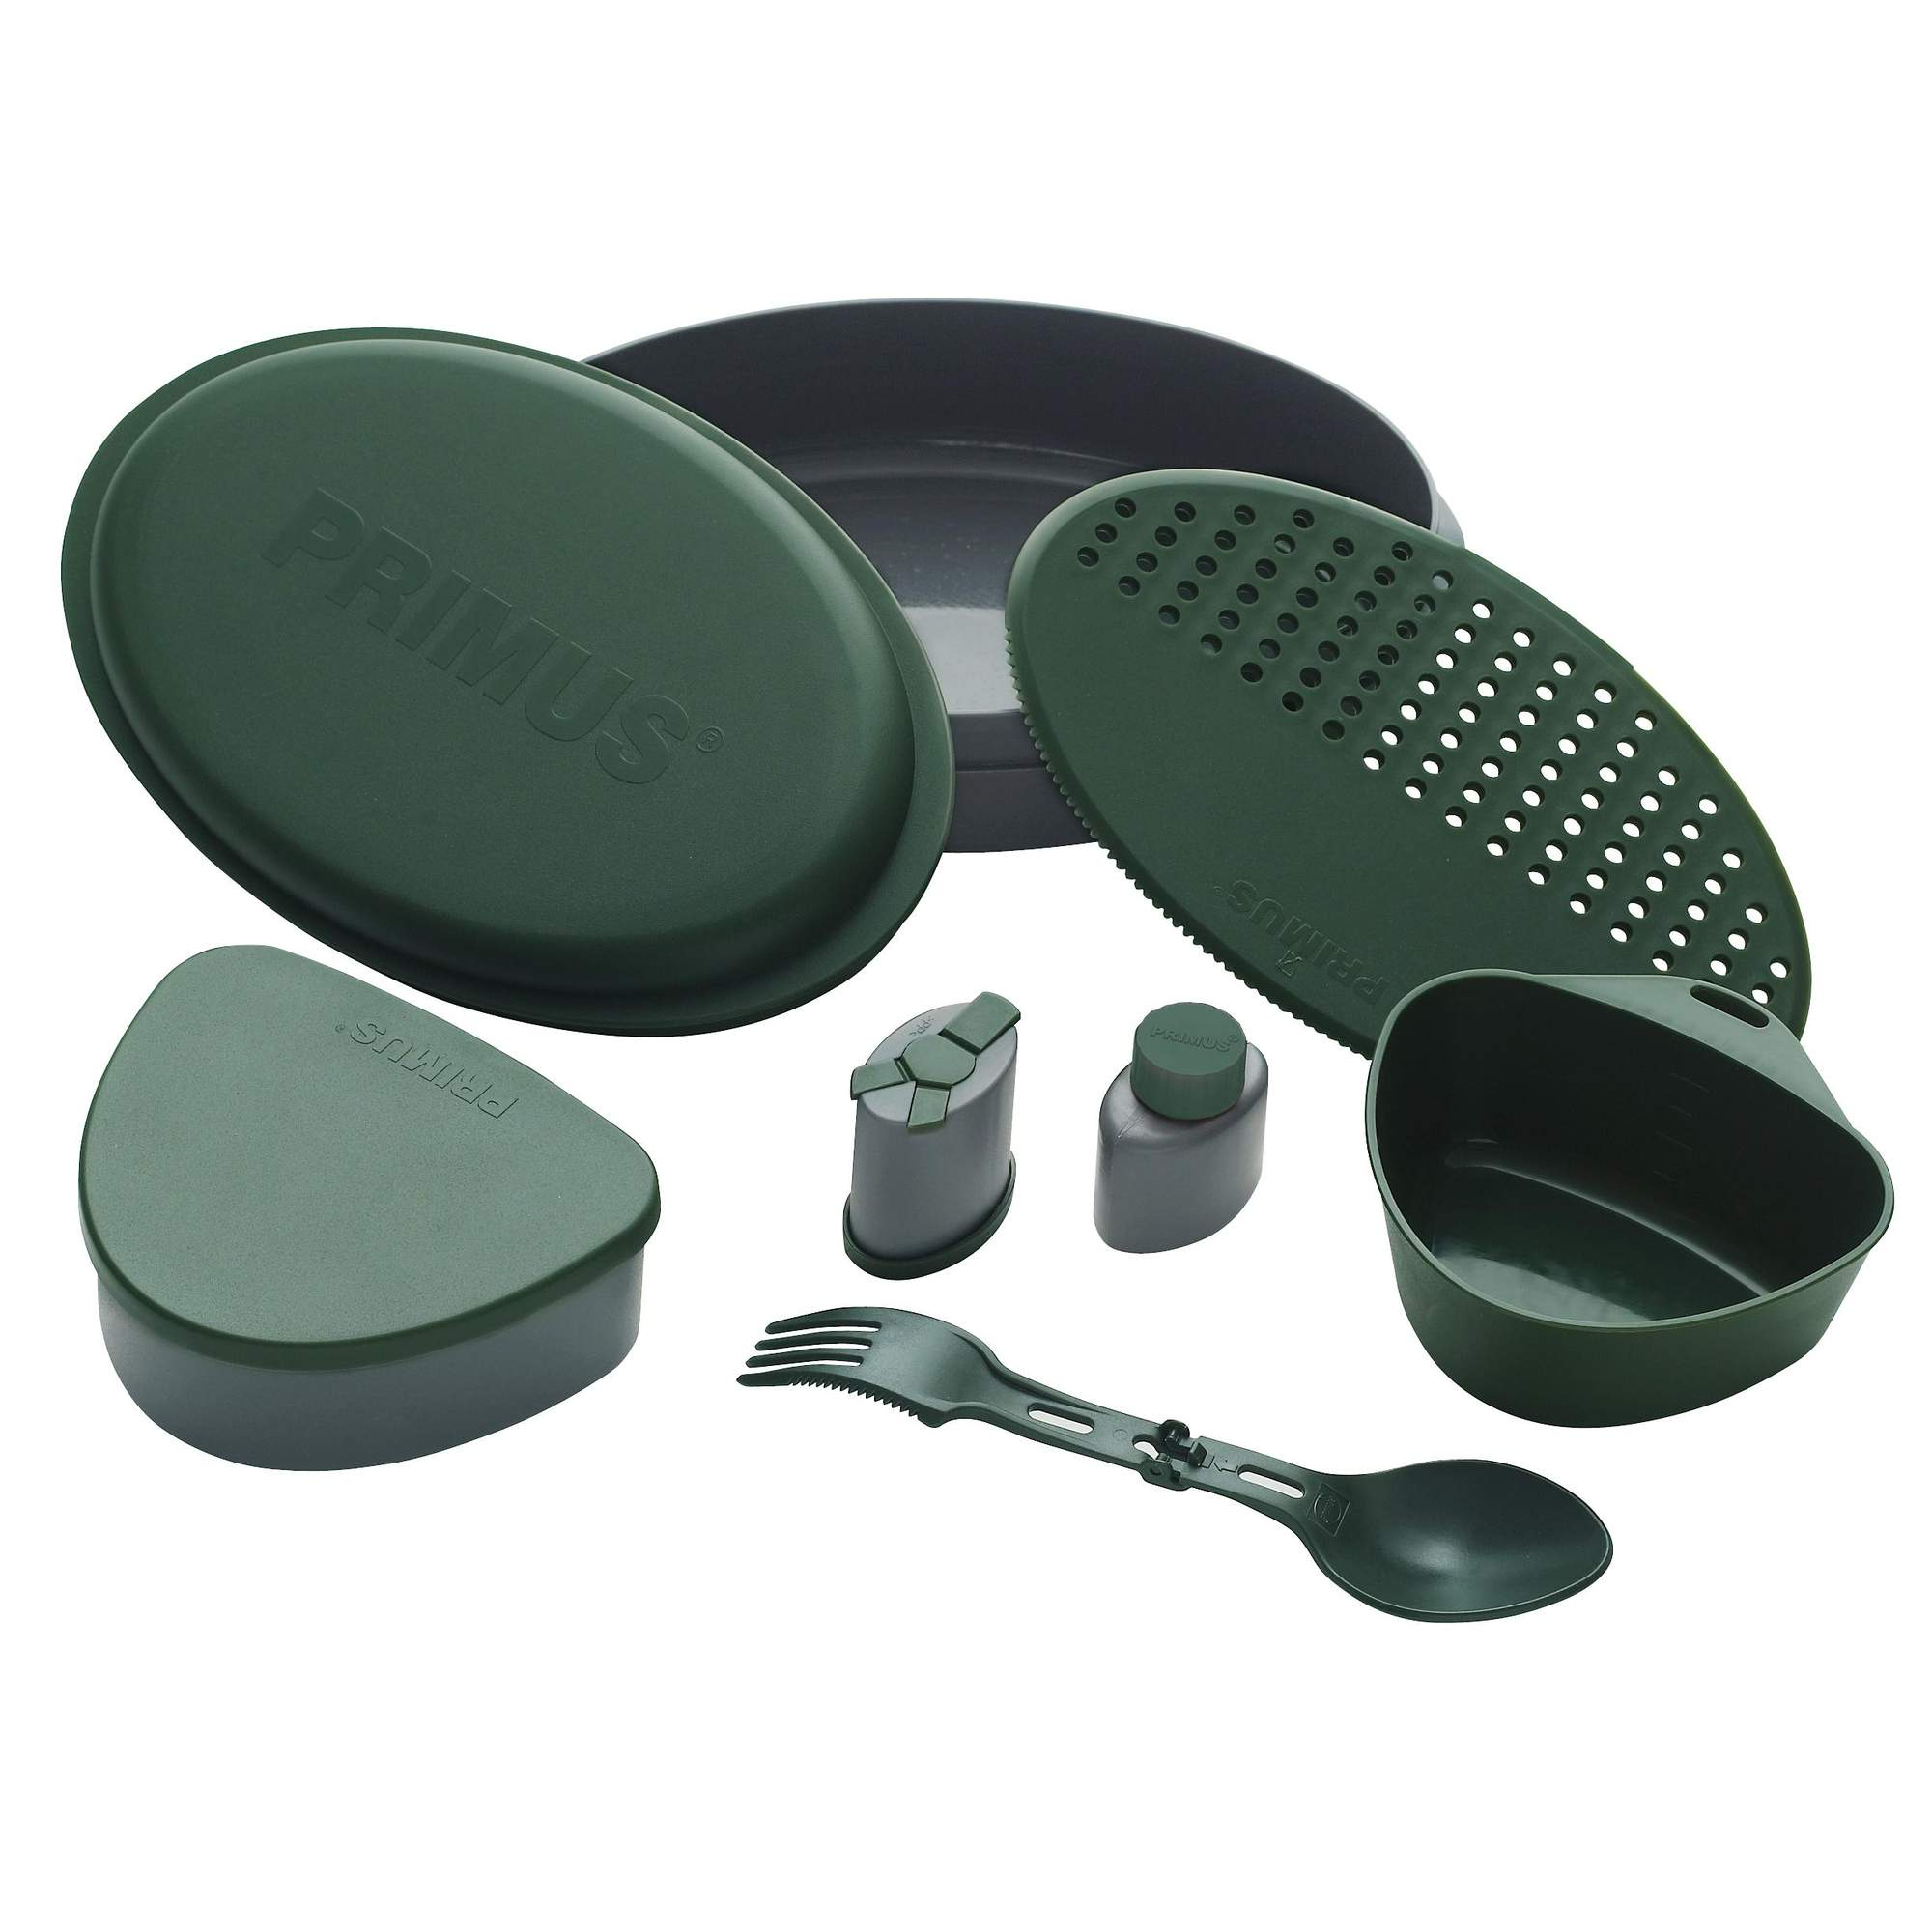 Primus P734002 Retkiastiasto vihreä, Meal Set Green